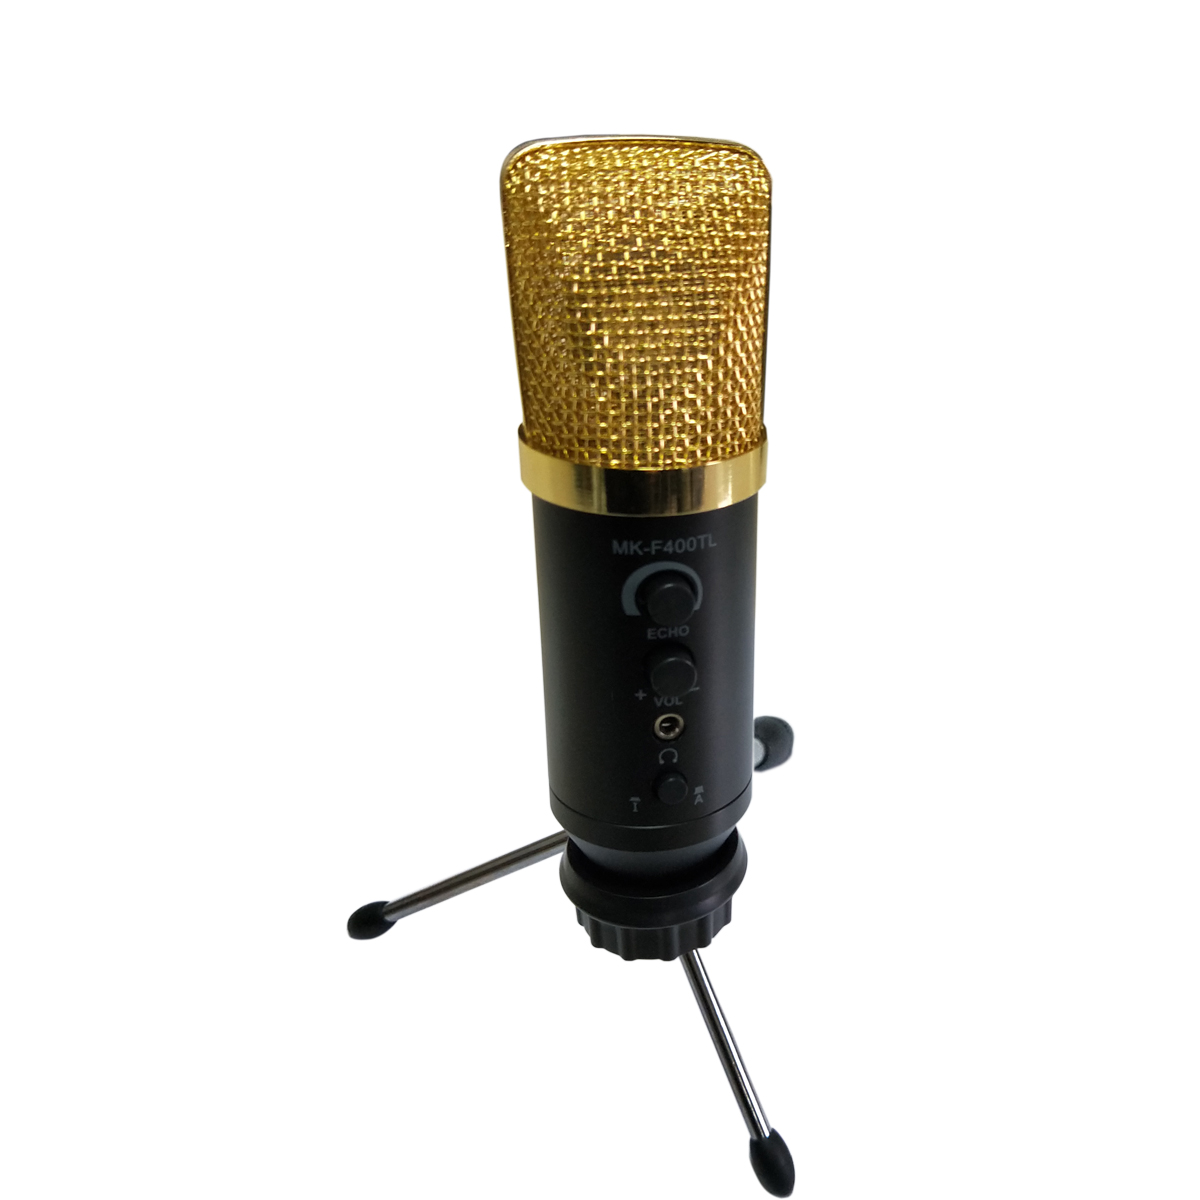 MKF400TL condenser microphone